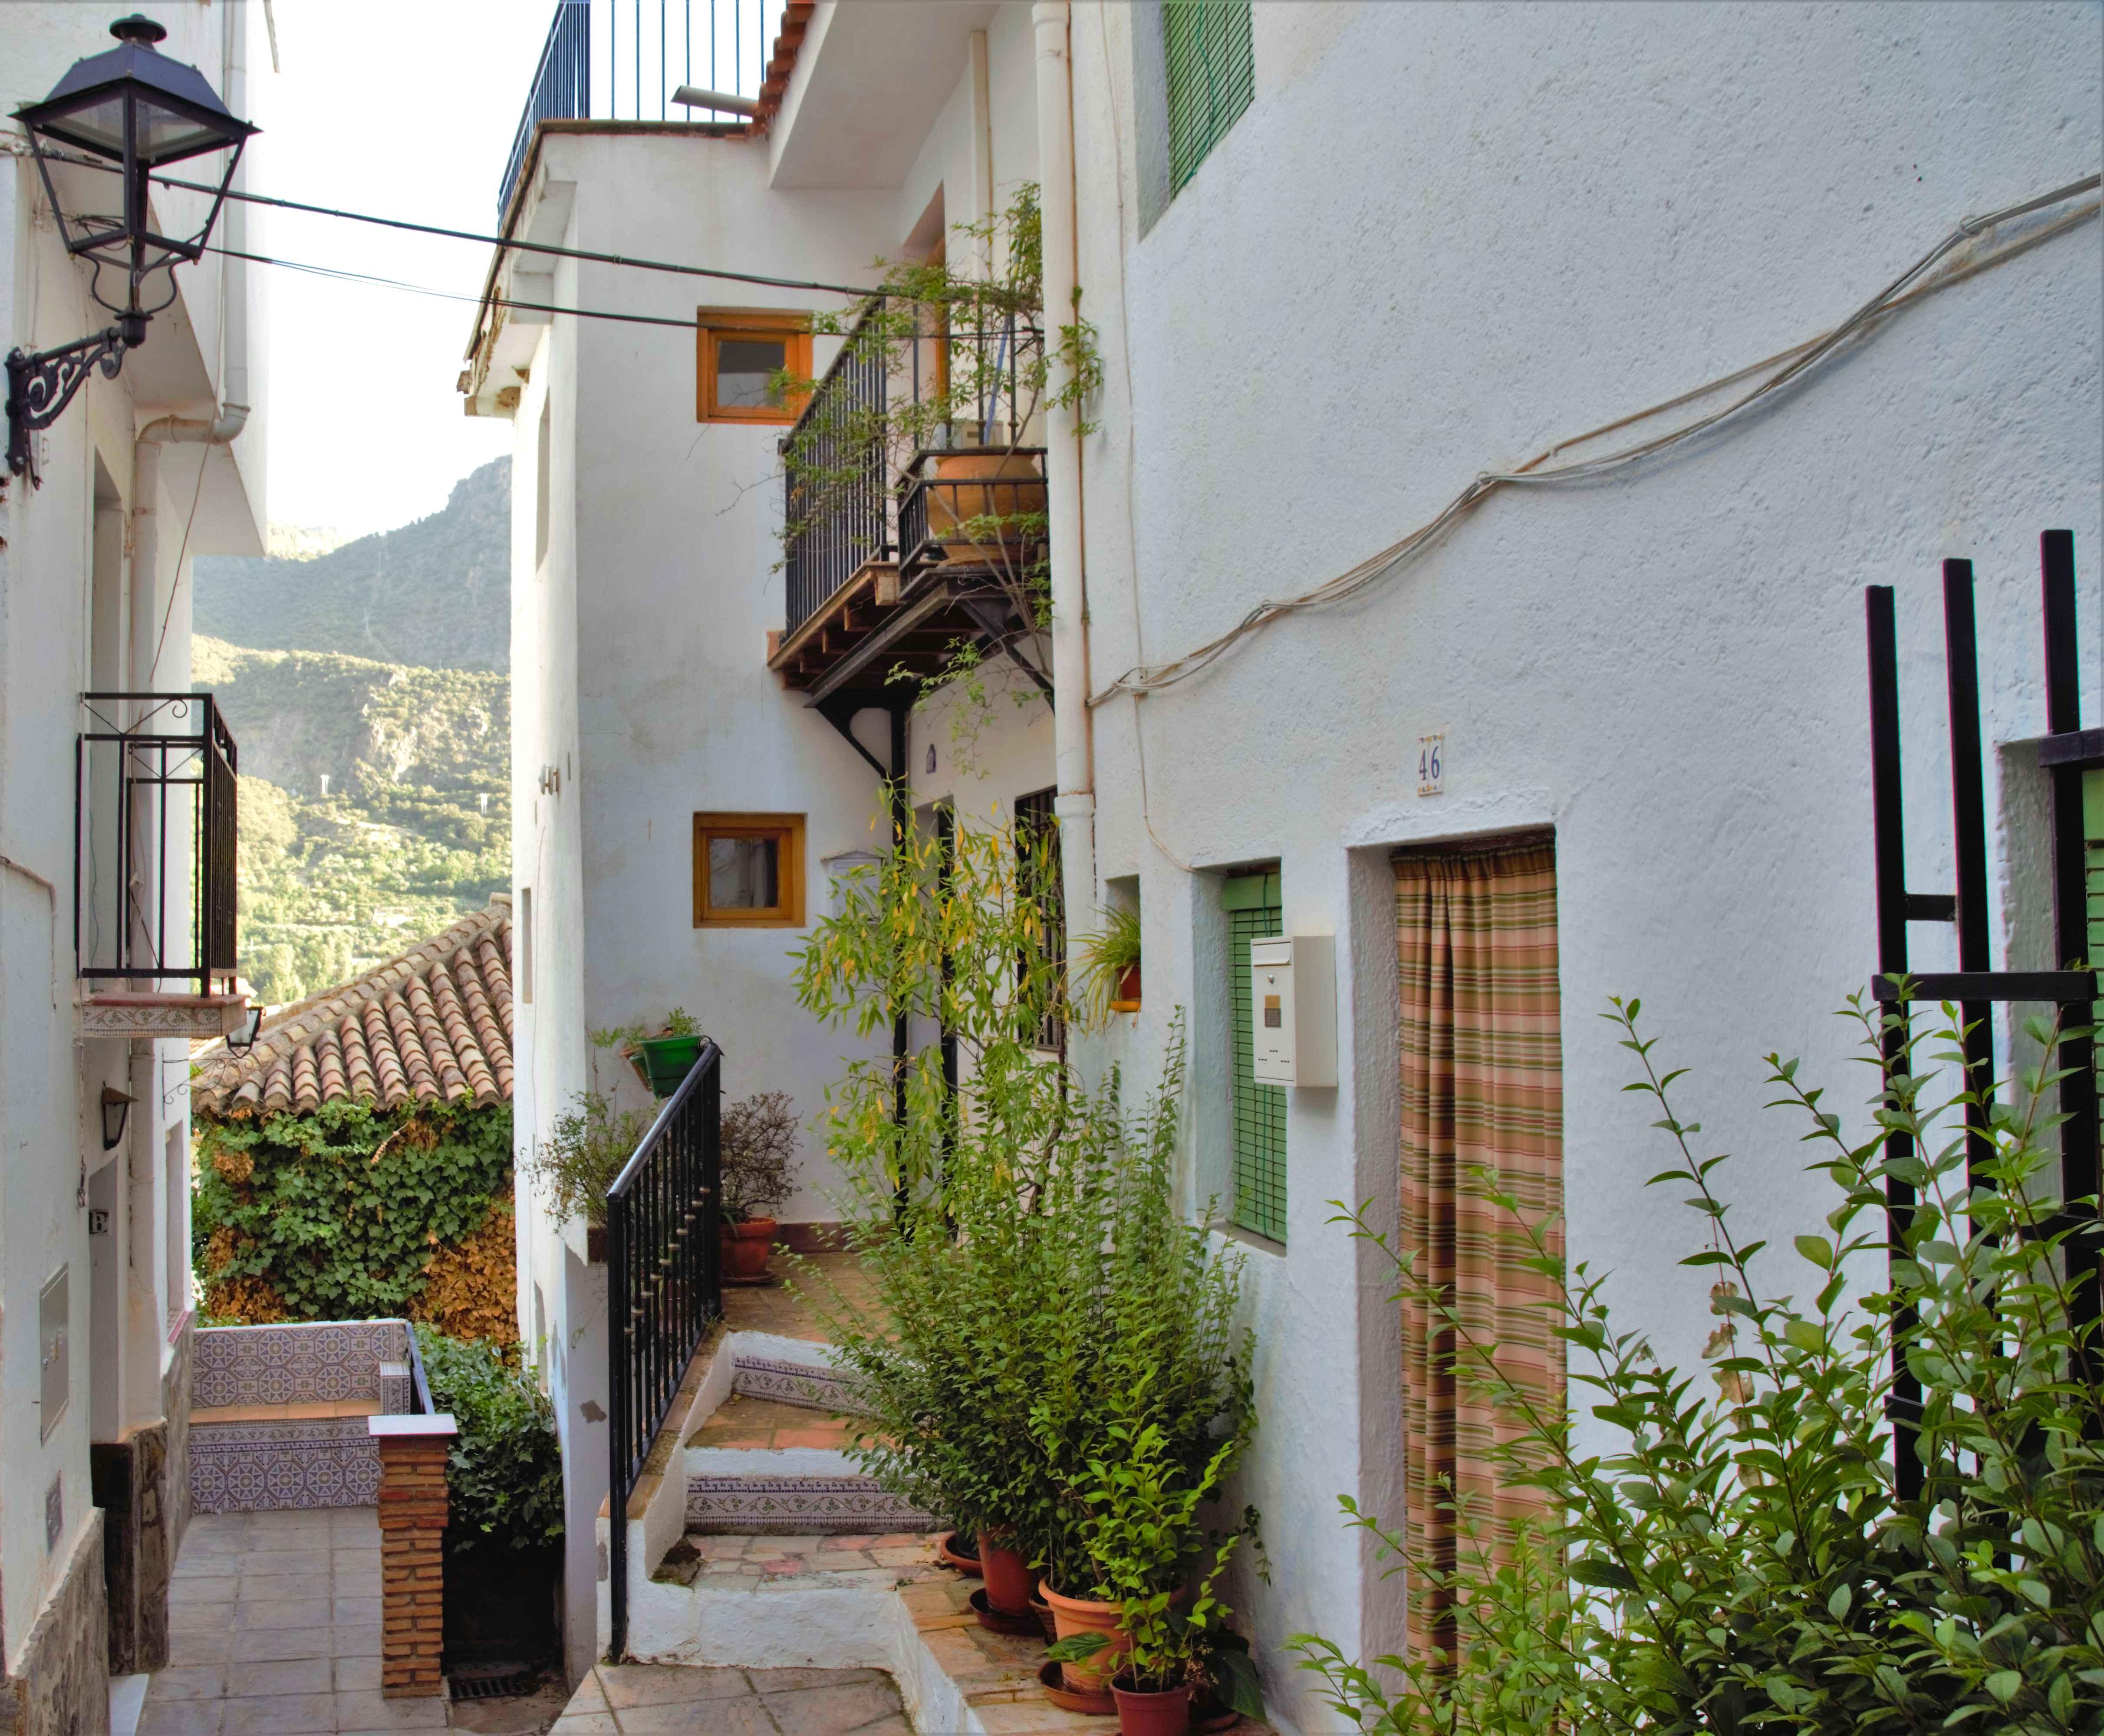 3 bedroom Townhouse for sale in Guejar Sierra